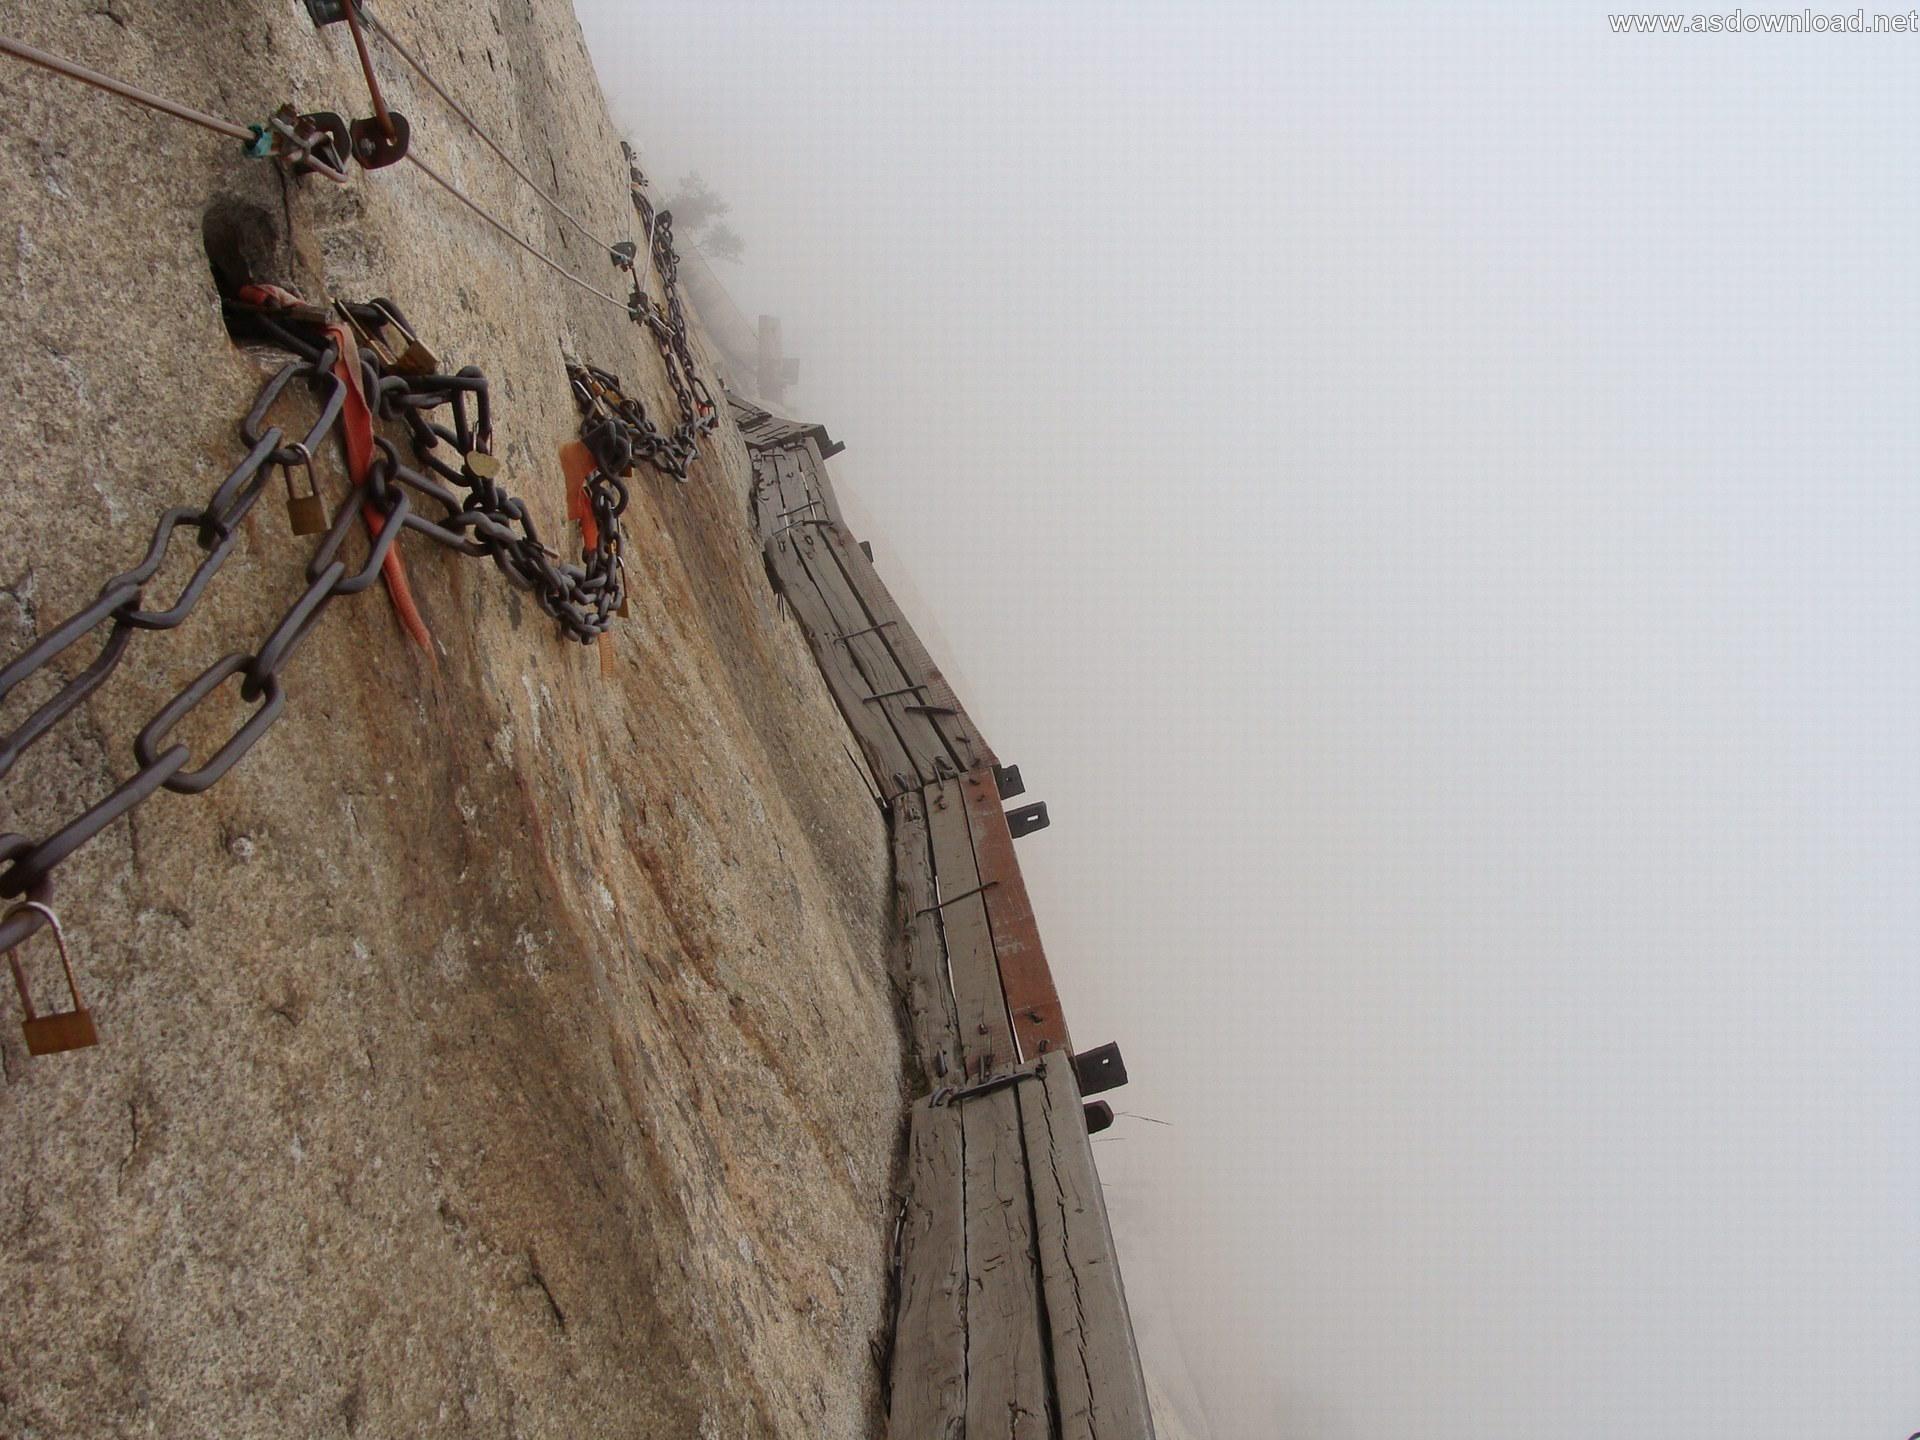 Mount-Huashan Danger Trail in world (52)